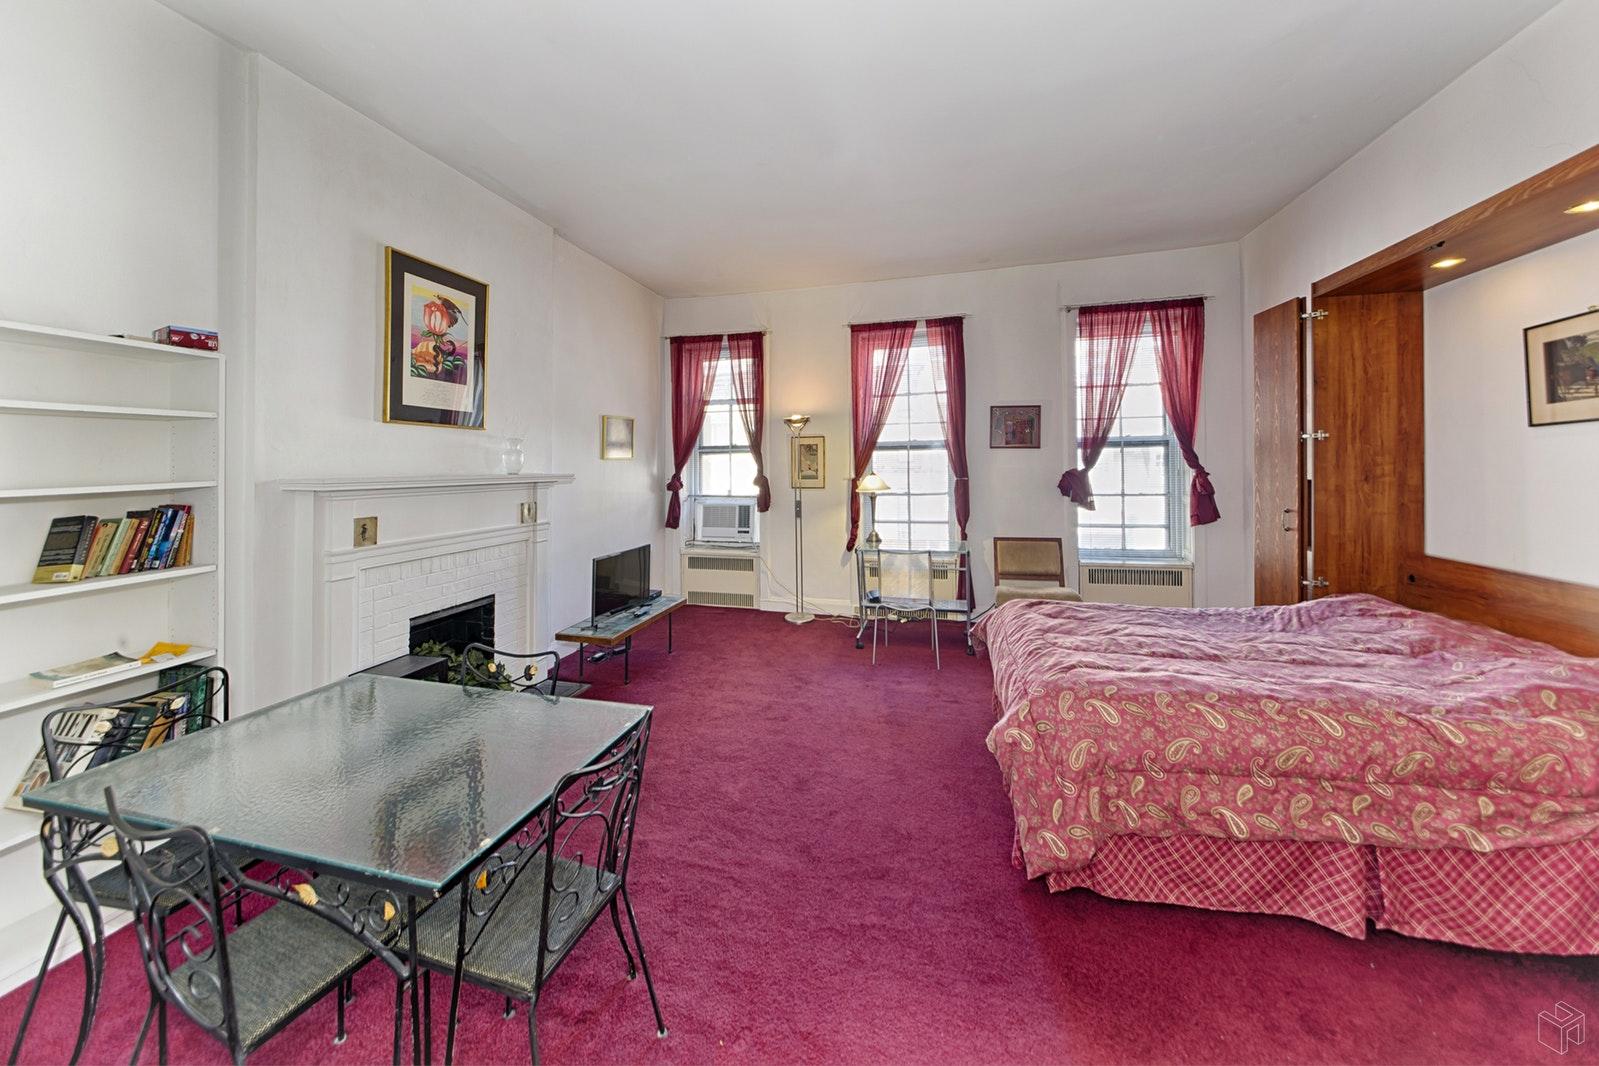 38 EAST 75TH STREET, Upper East Side, $13,900,000, Web #: 16866177